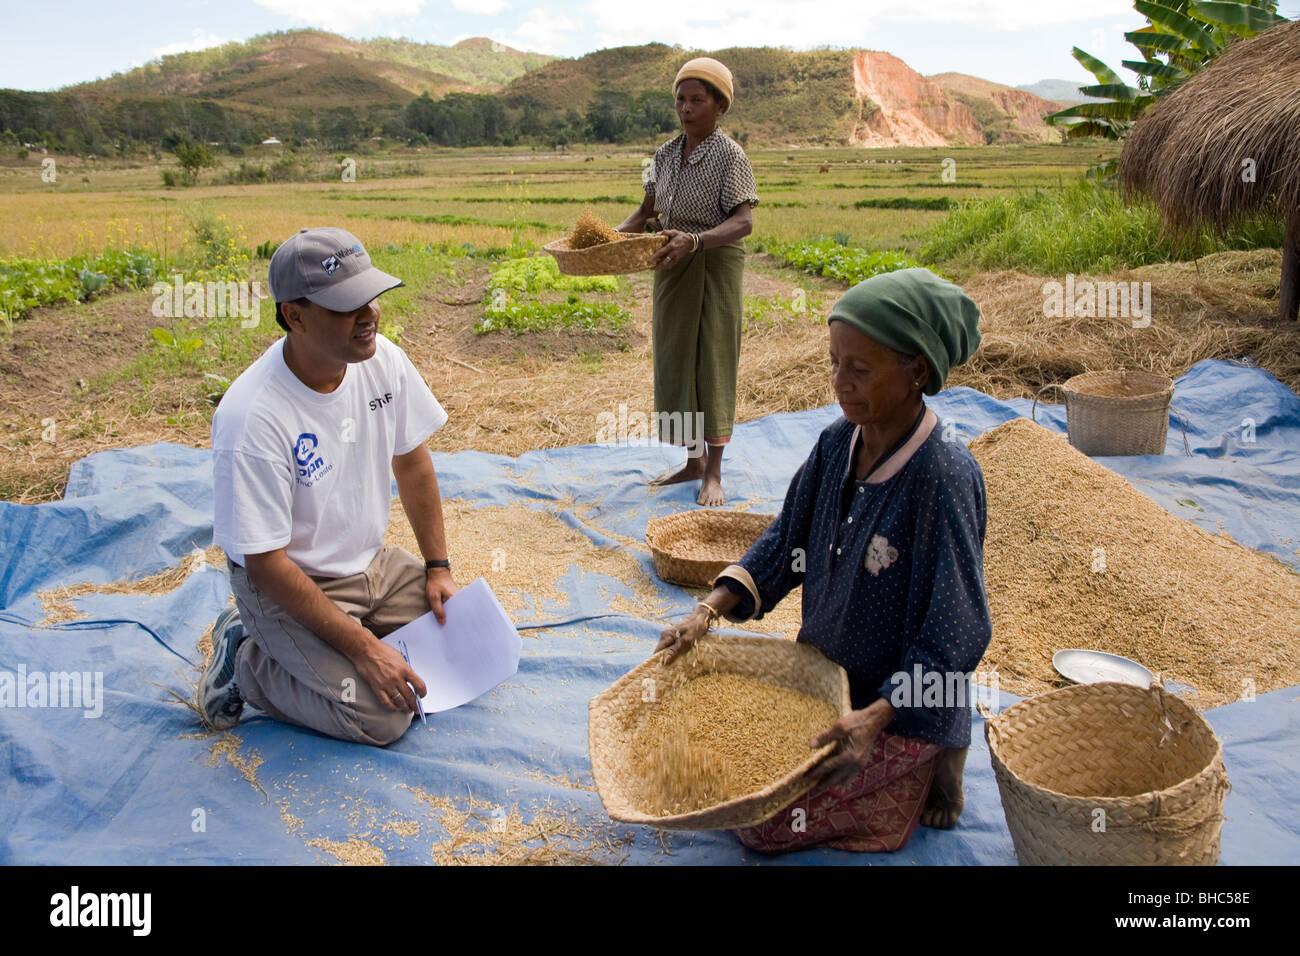 Elcolbere village hard-working women farmers Maria Moniz & Domingues da Silva sort and glean their rice and - Stock Image